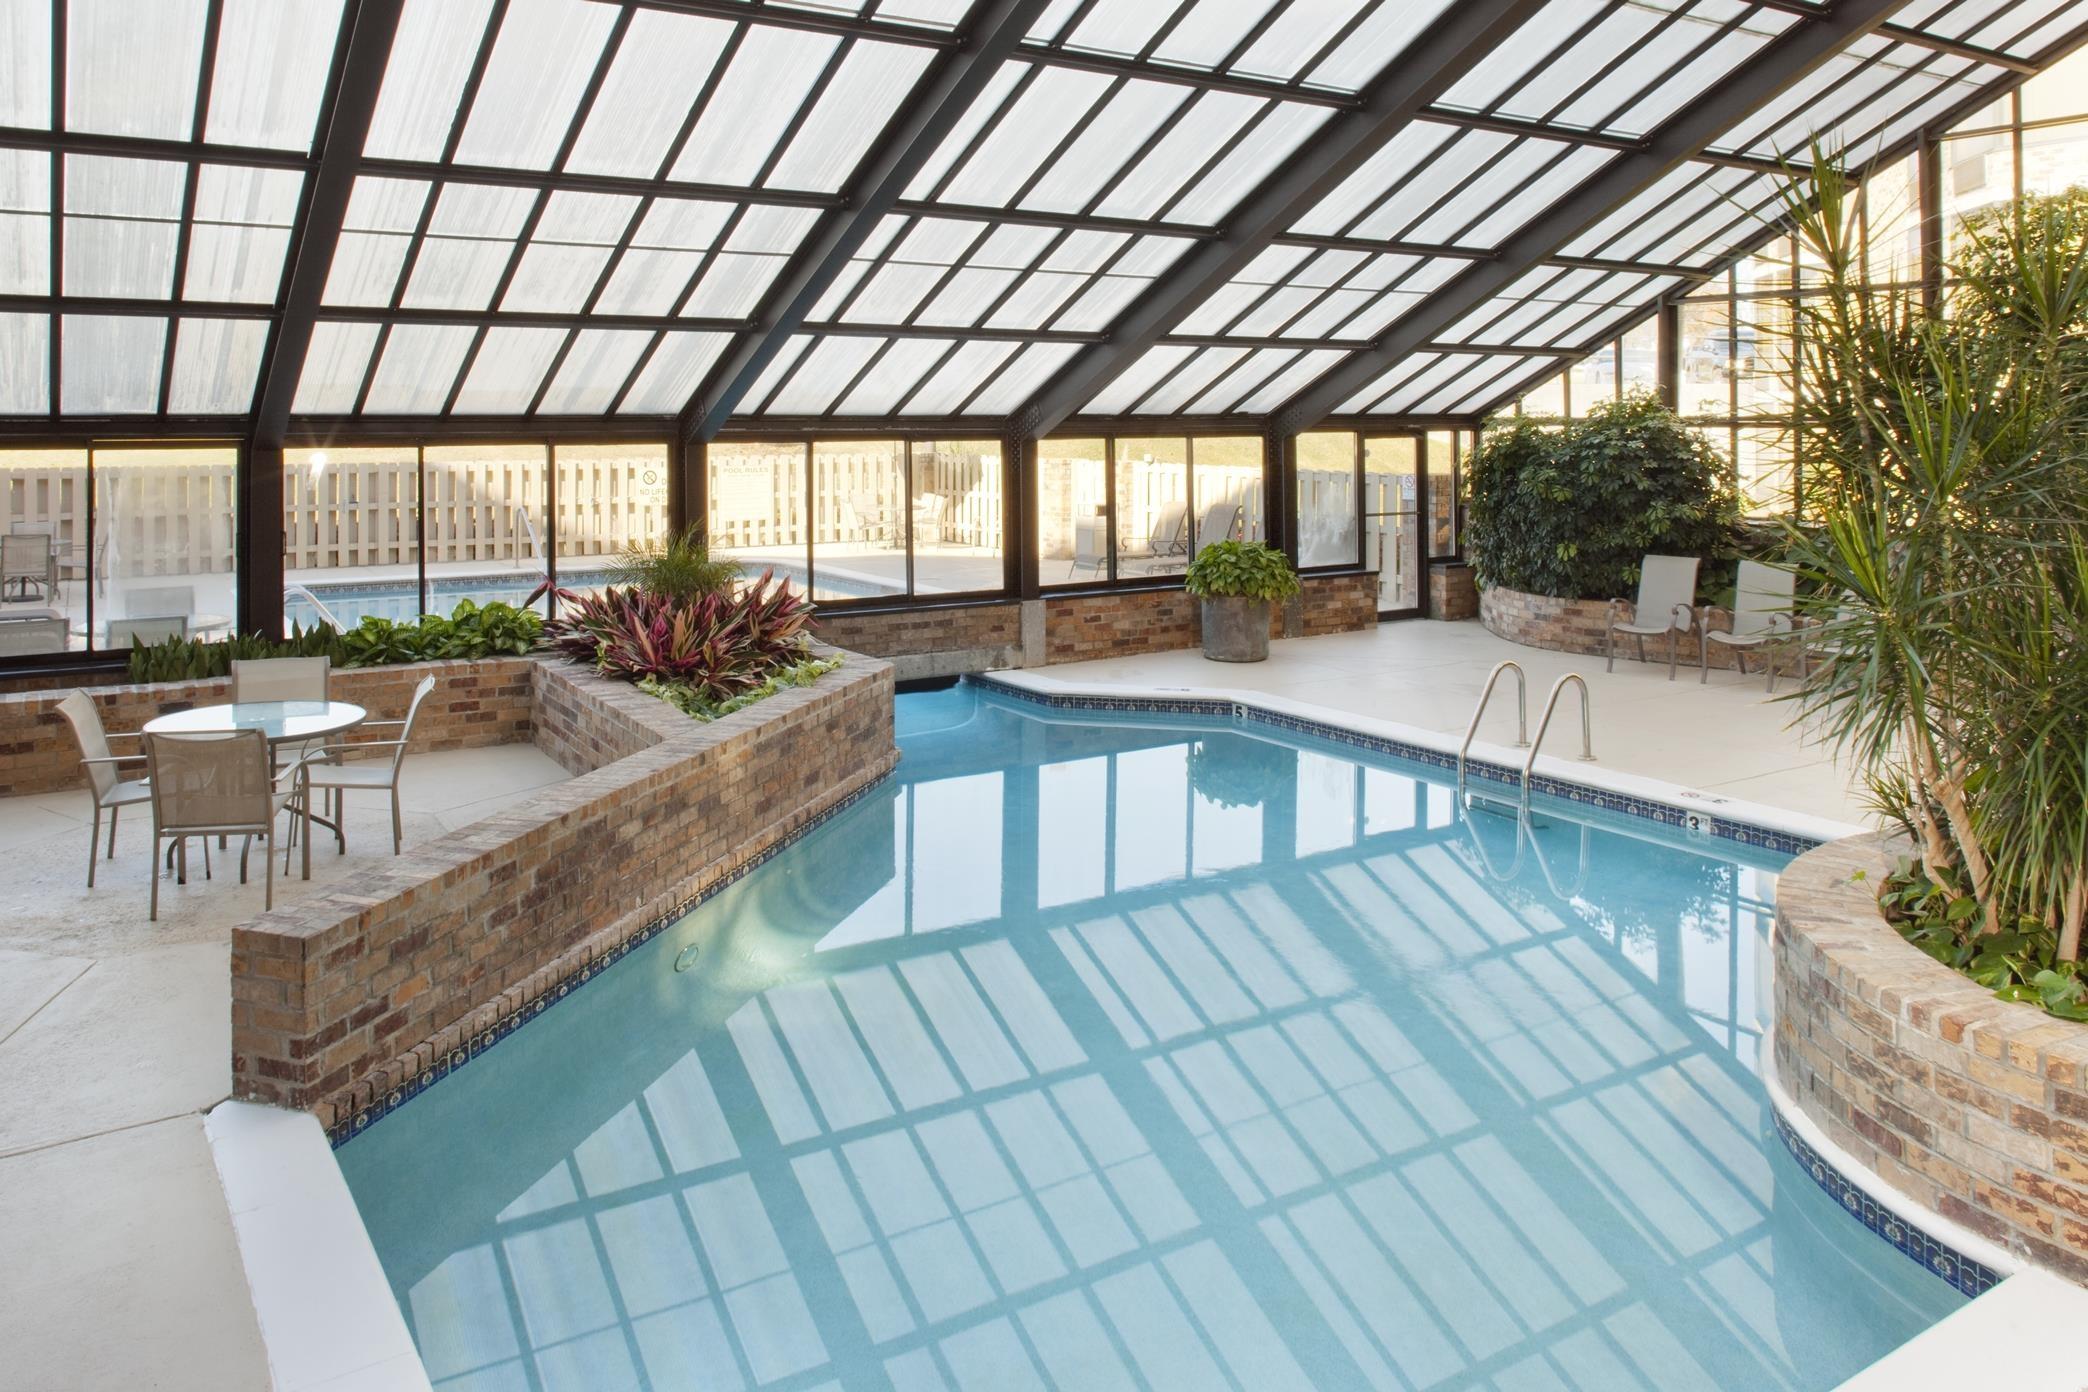 DoubleTree by Hilton Hotel Oak Ridge - Knoxville image 6